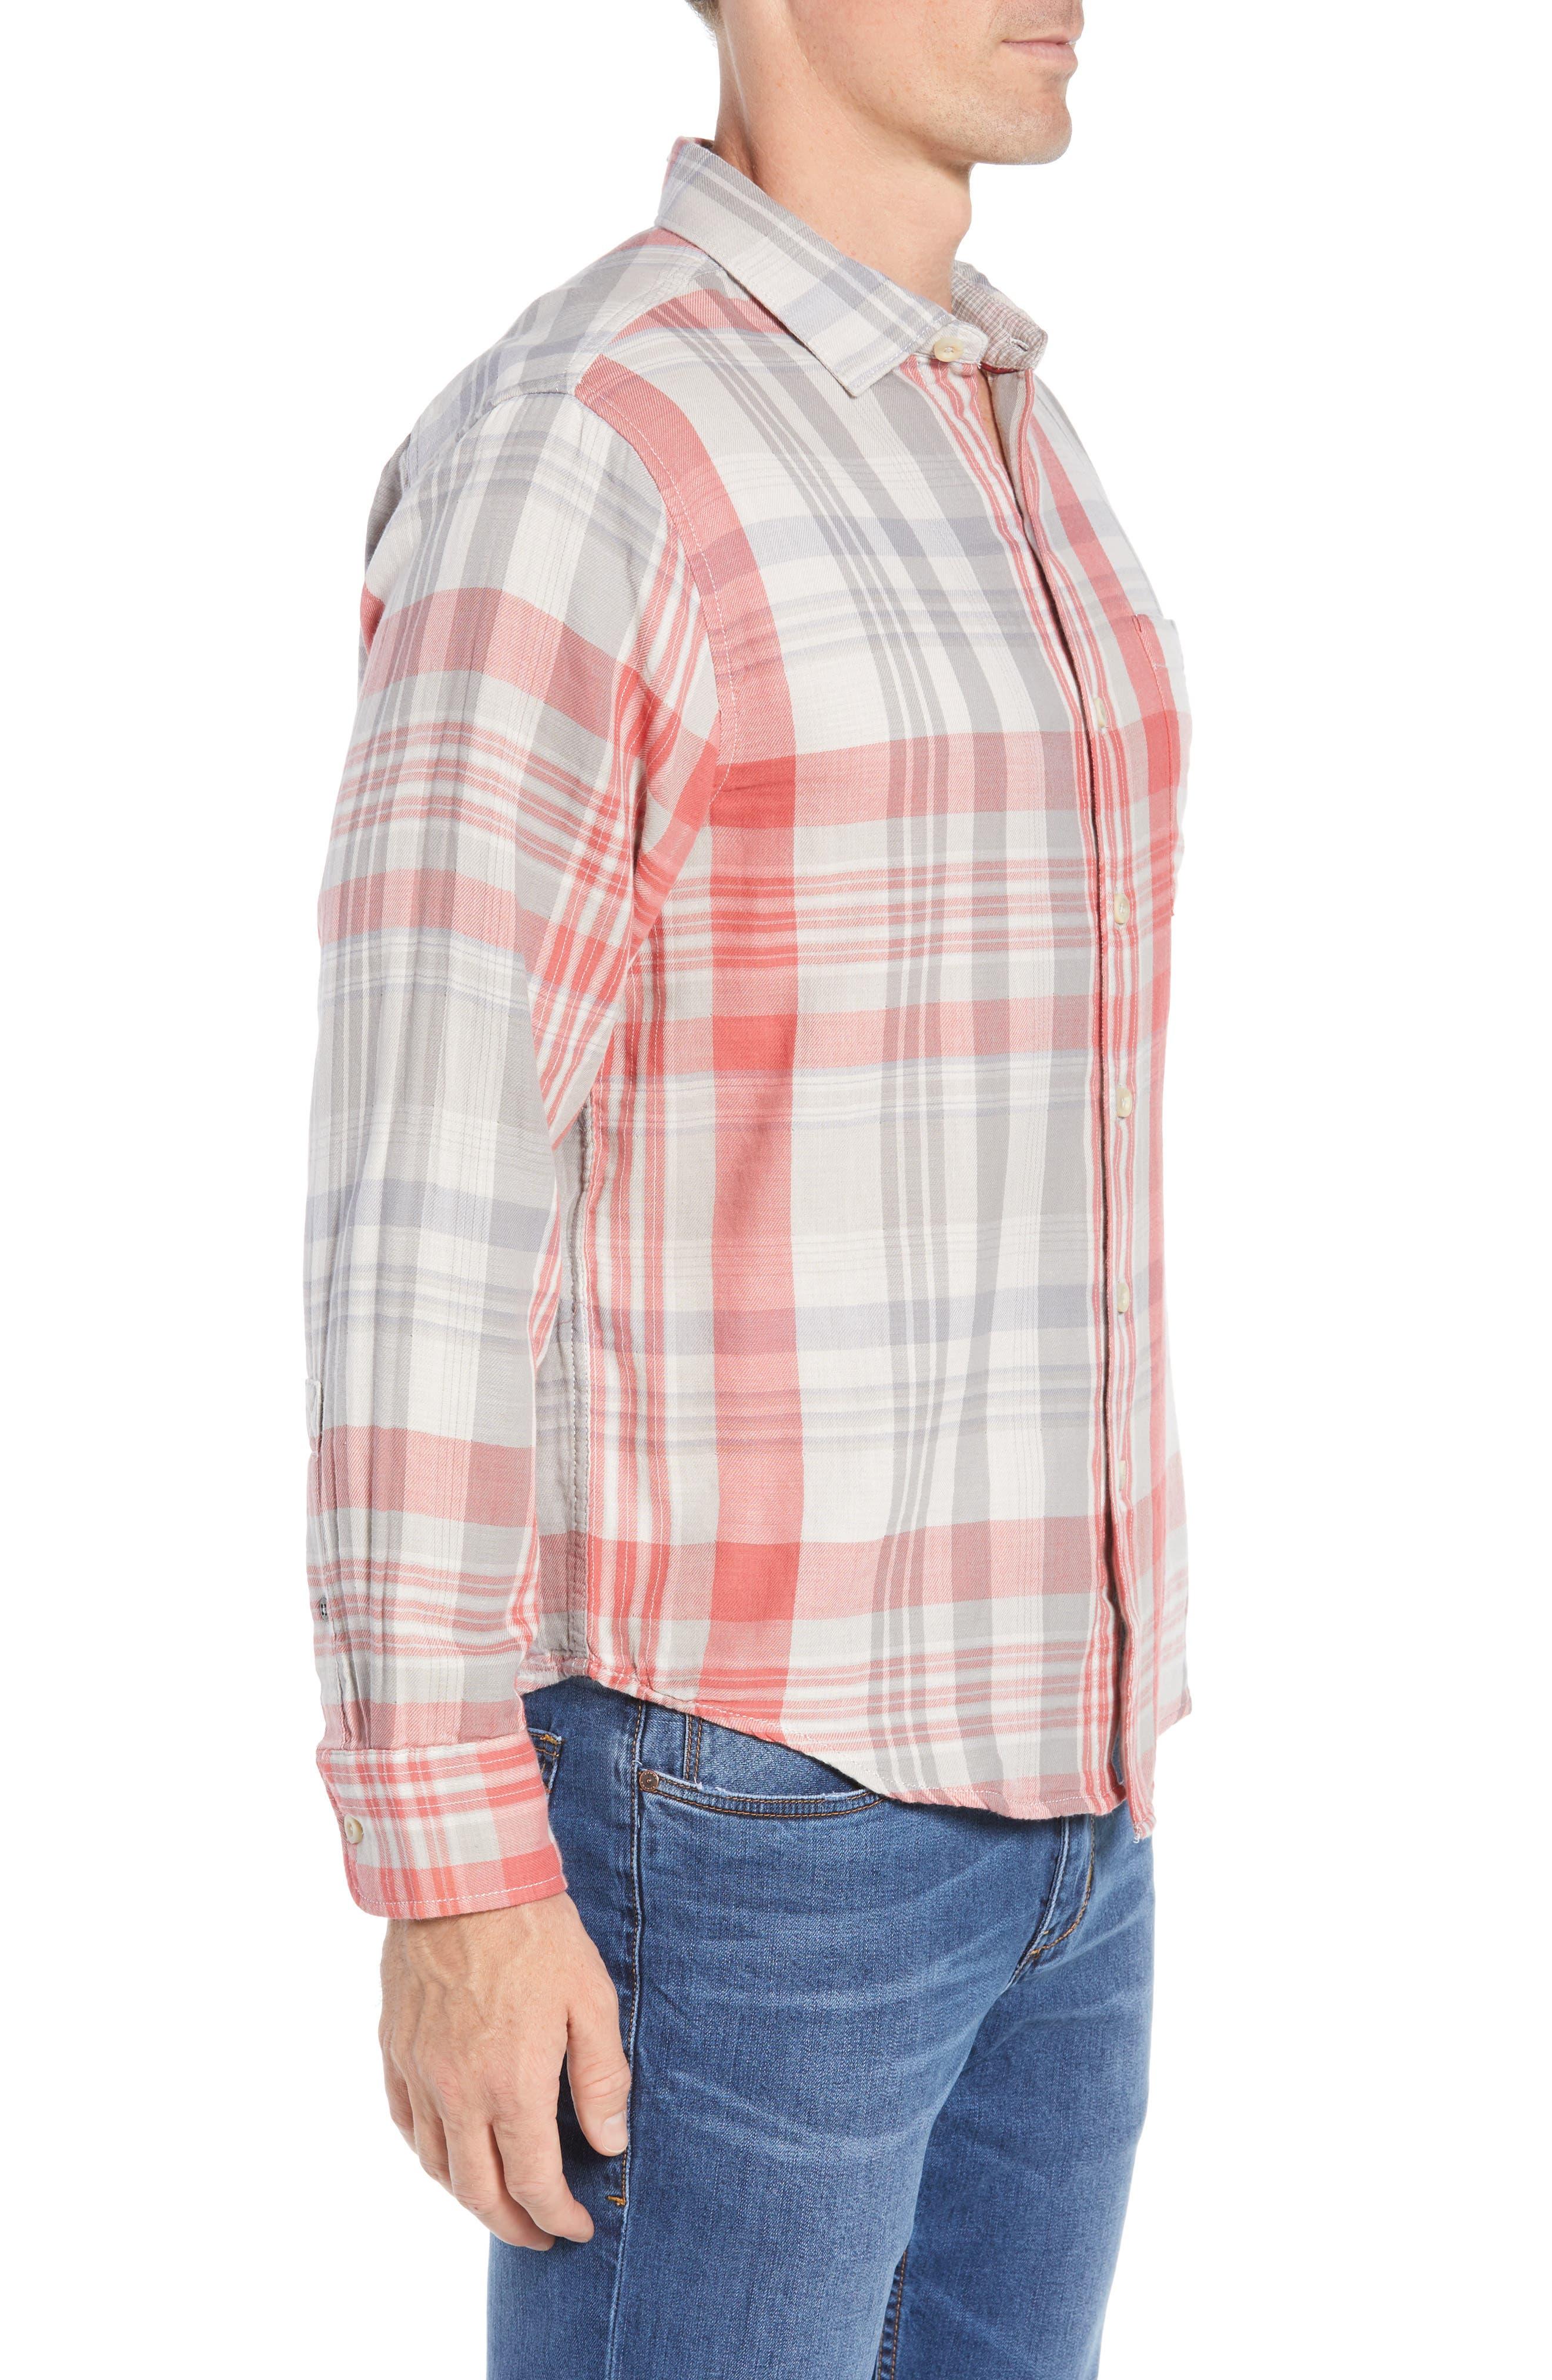 Monteverde Madras Regular Fit Shirt,                             Alternate thumbnail 4, color,                             POINCIANA